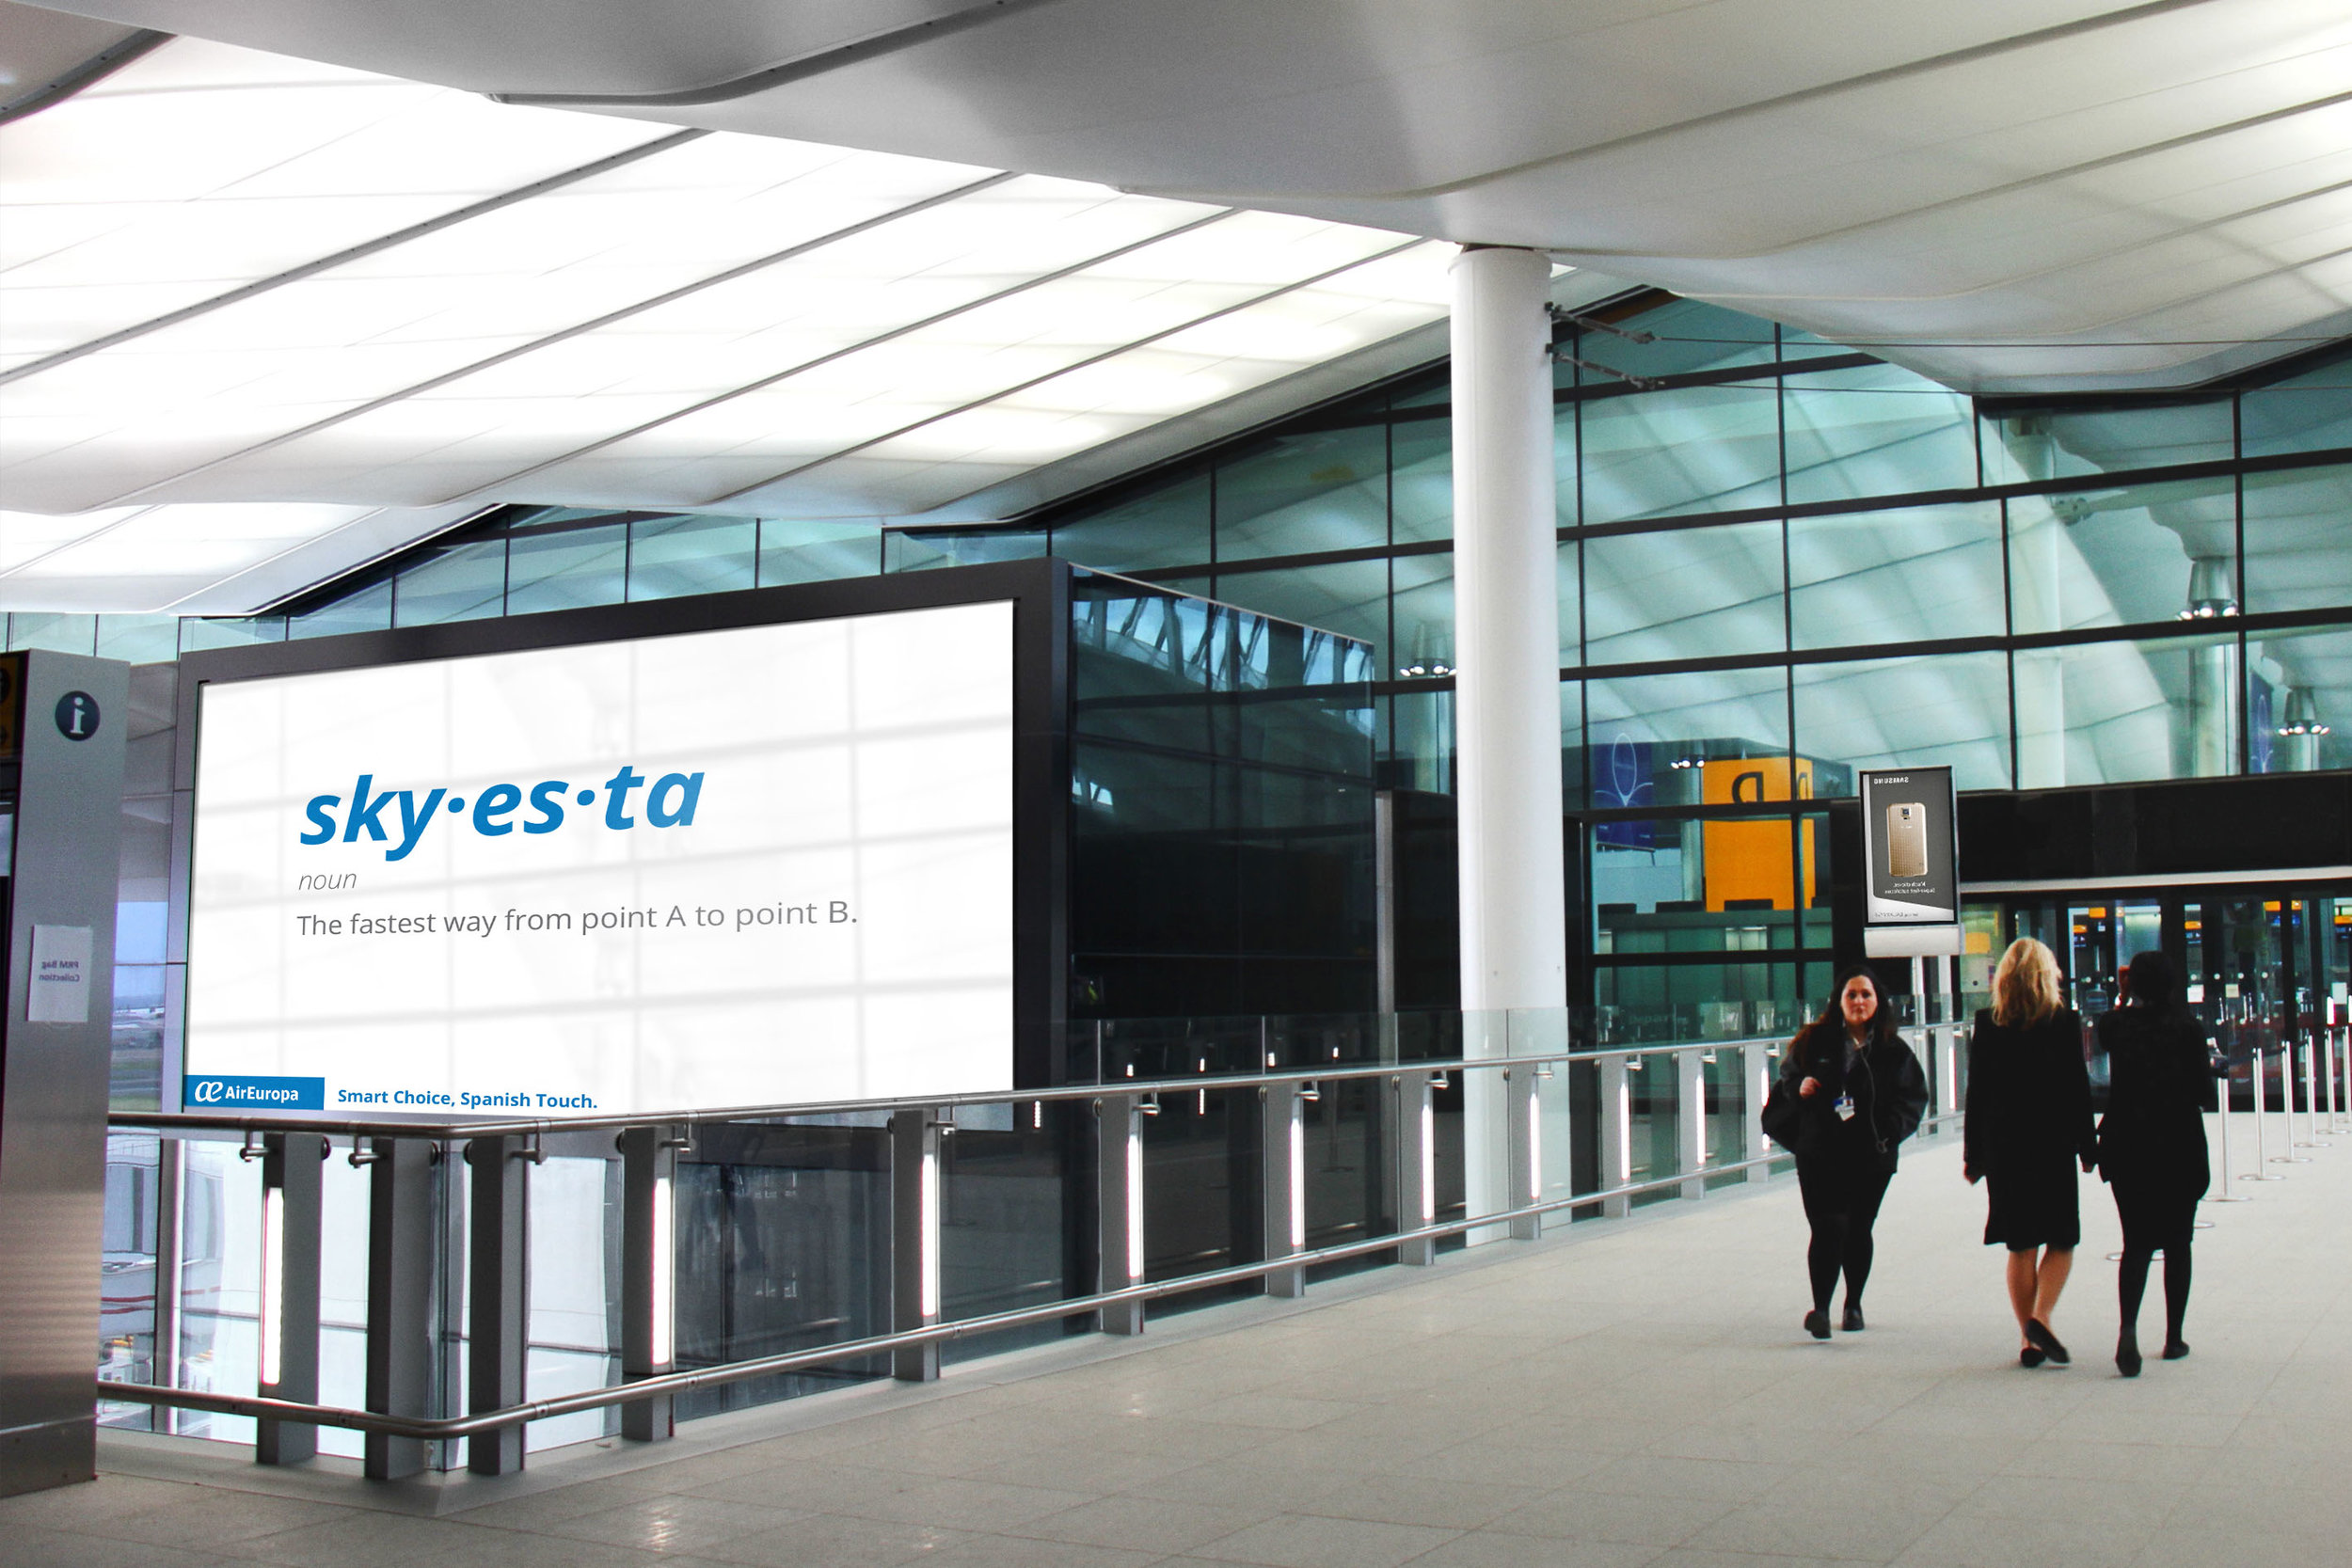 air europa billboards 3.jpg